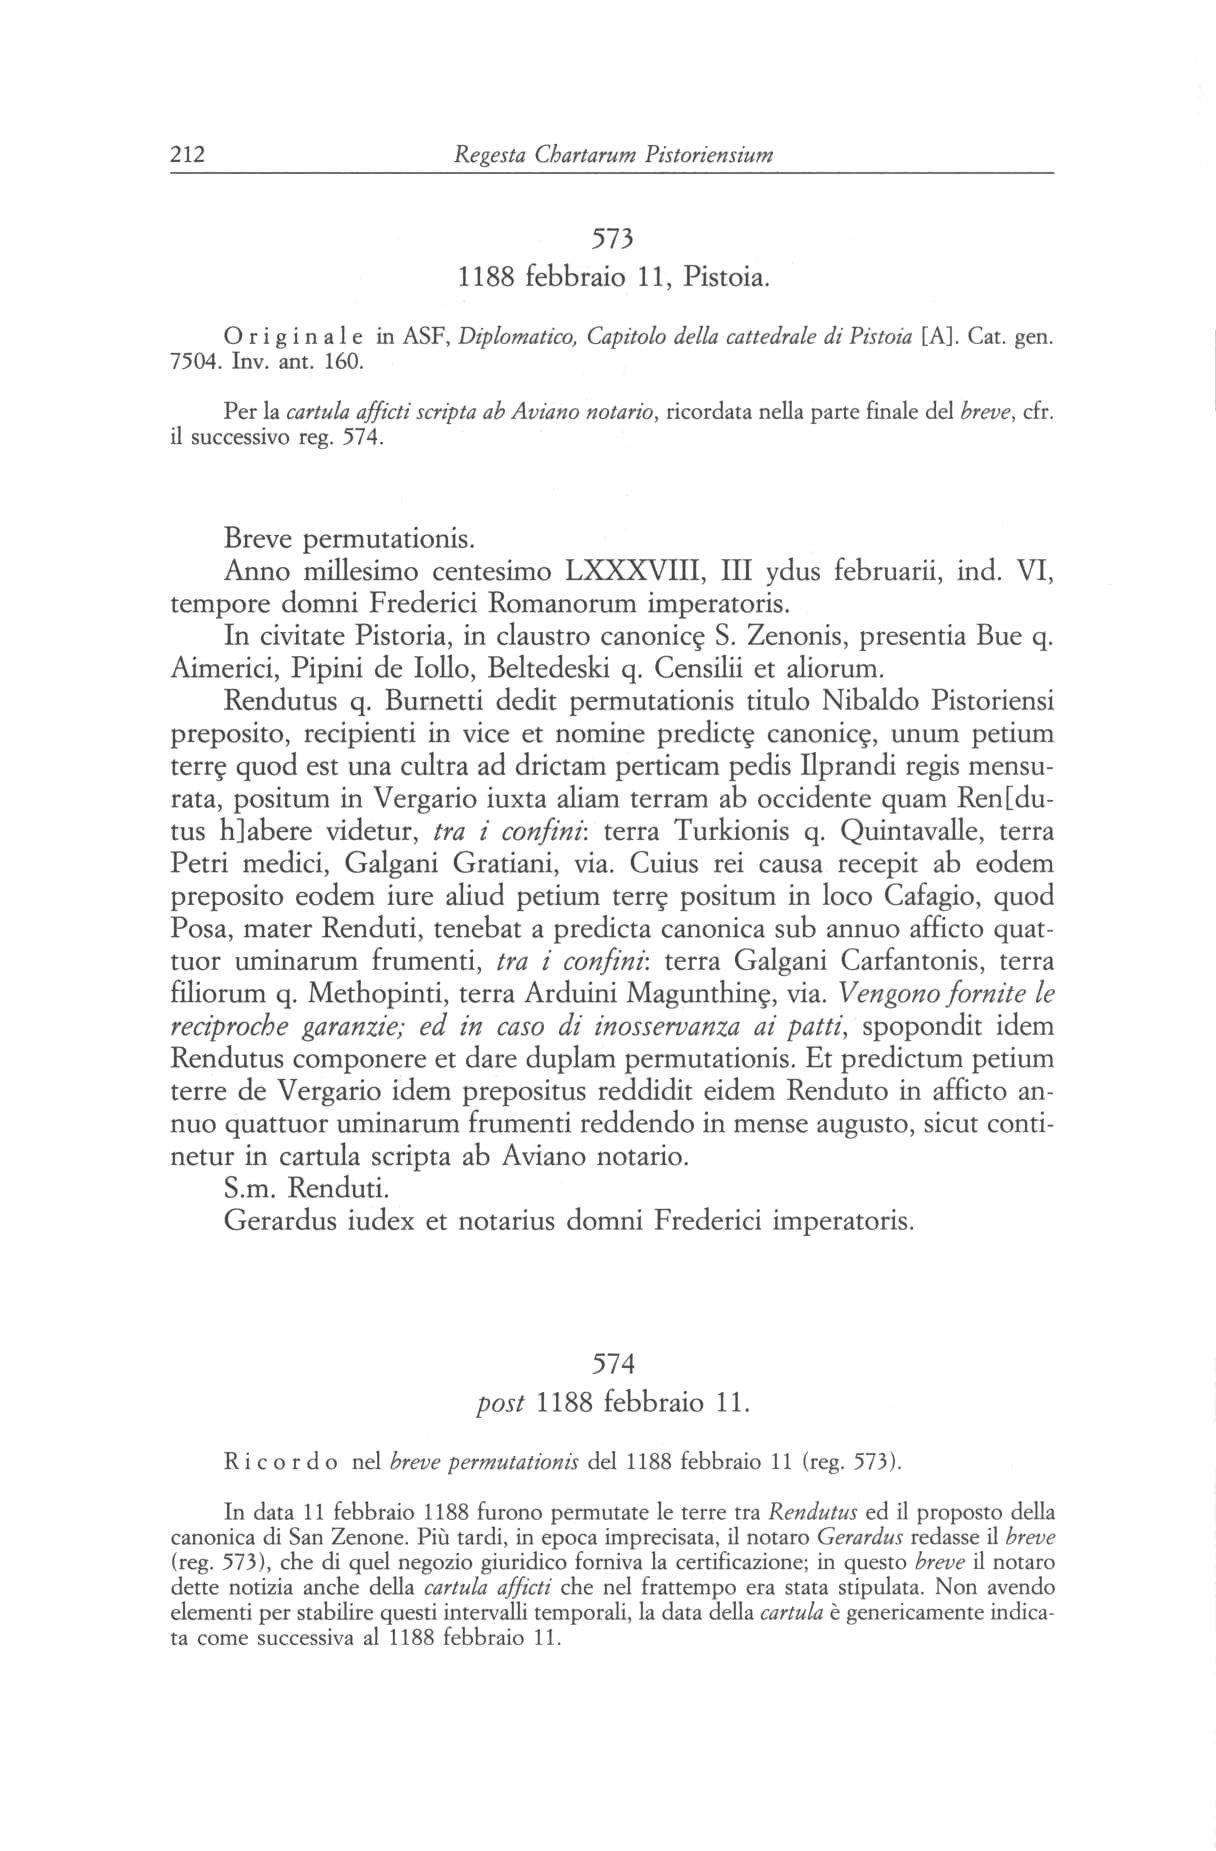 Canonica S. Zenone XII 0212.jpg